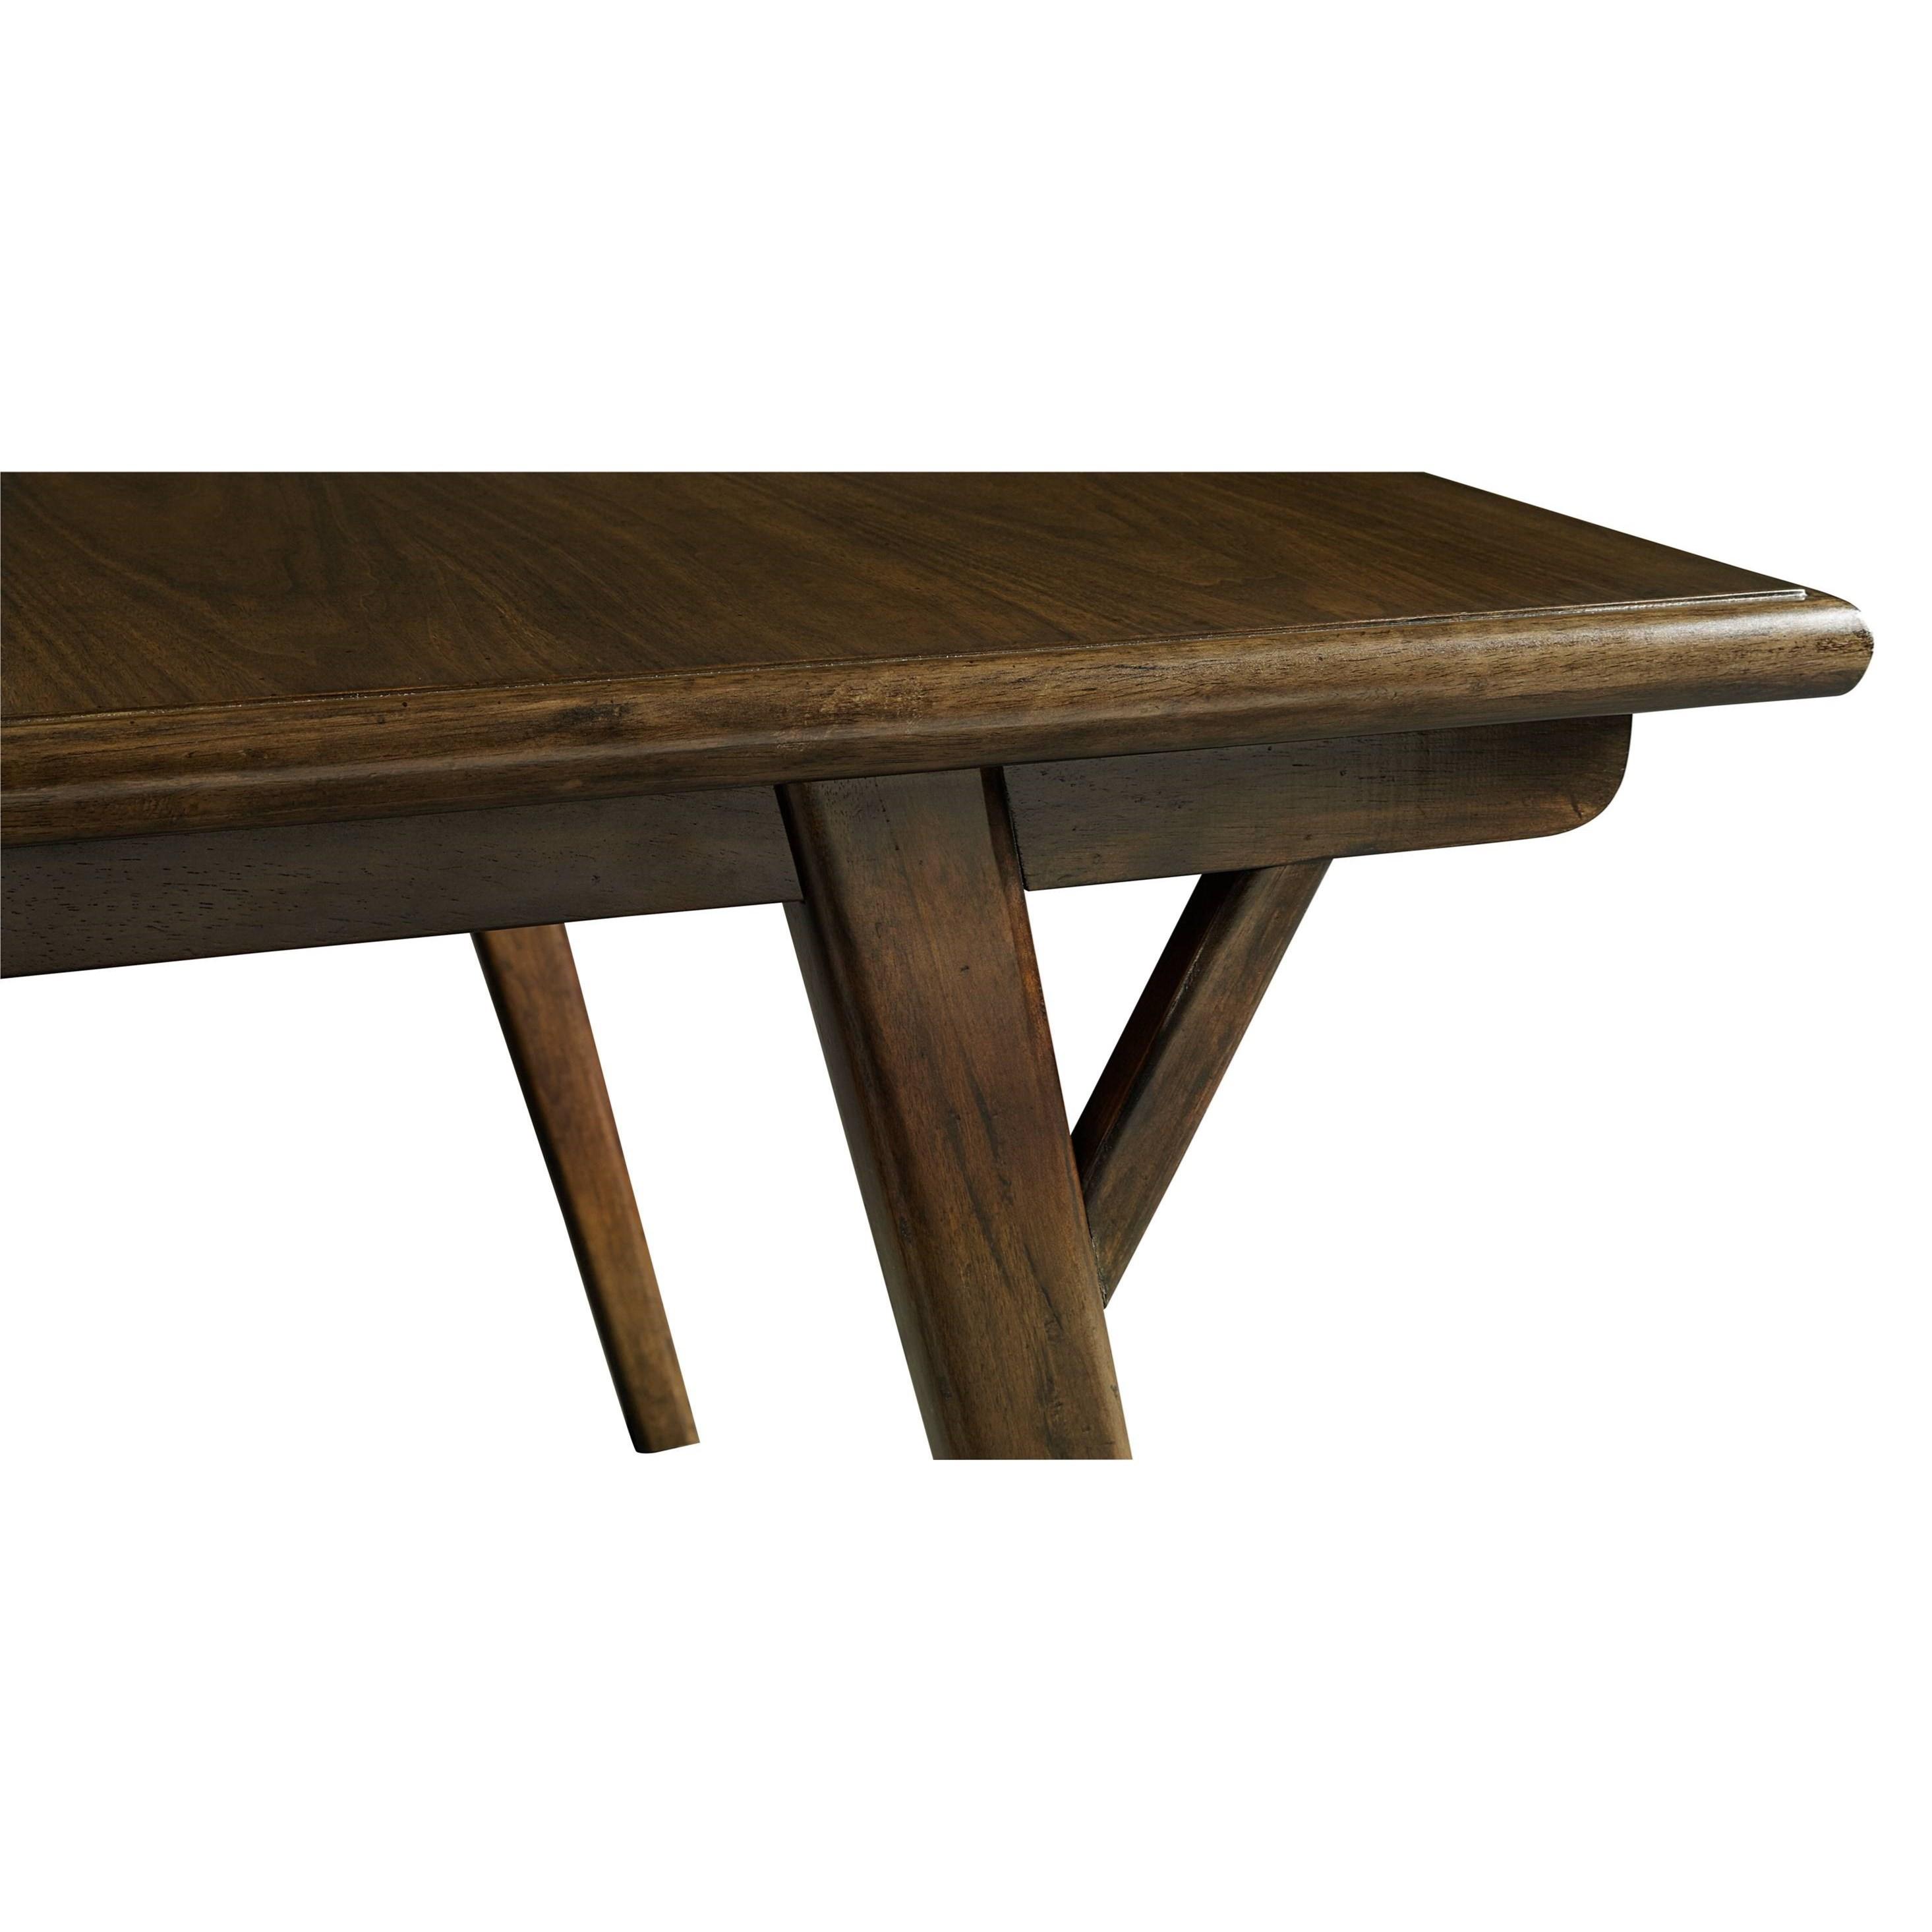 Stanley Furniture Santa Clara Rectangular Dining Table  : products2Fstanleyfurniture2Fcolor2Fsanta20clara 894805332585 11 36 b5 from www.belfortfurniture.com size 2931 x 2931 jpeg 480kB